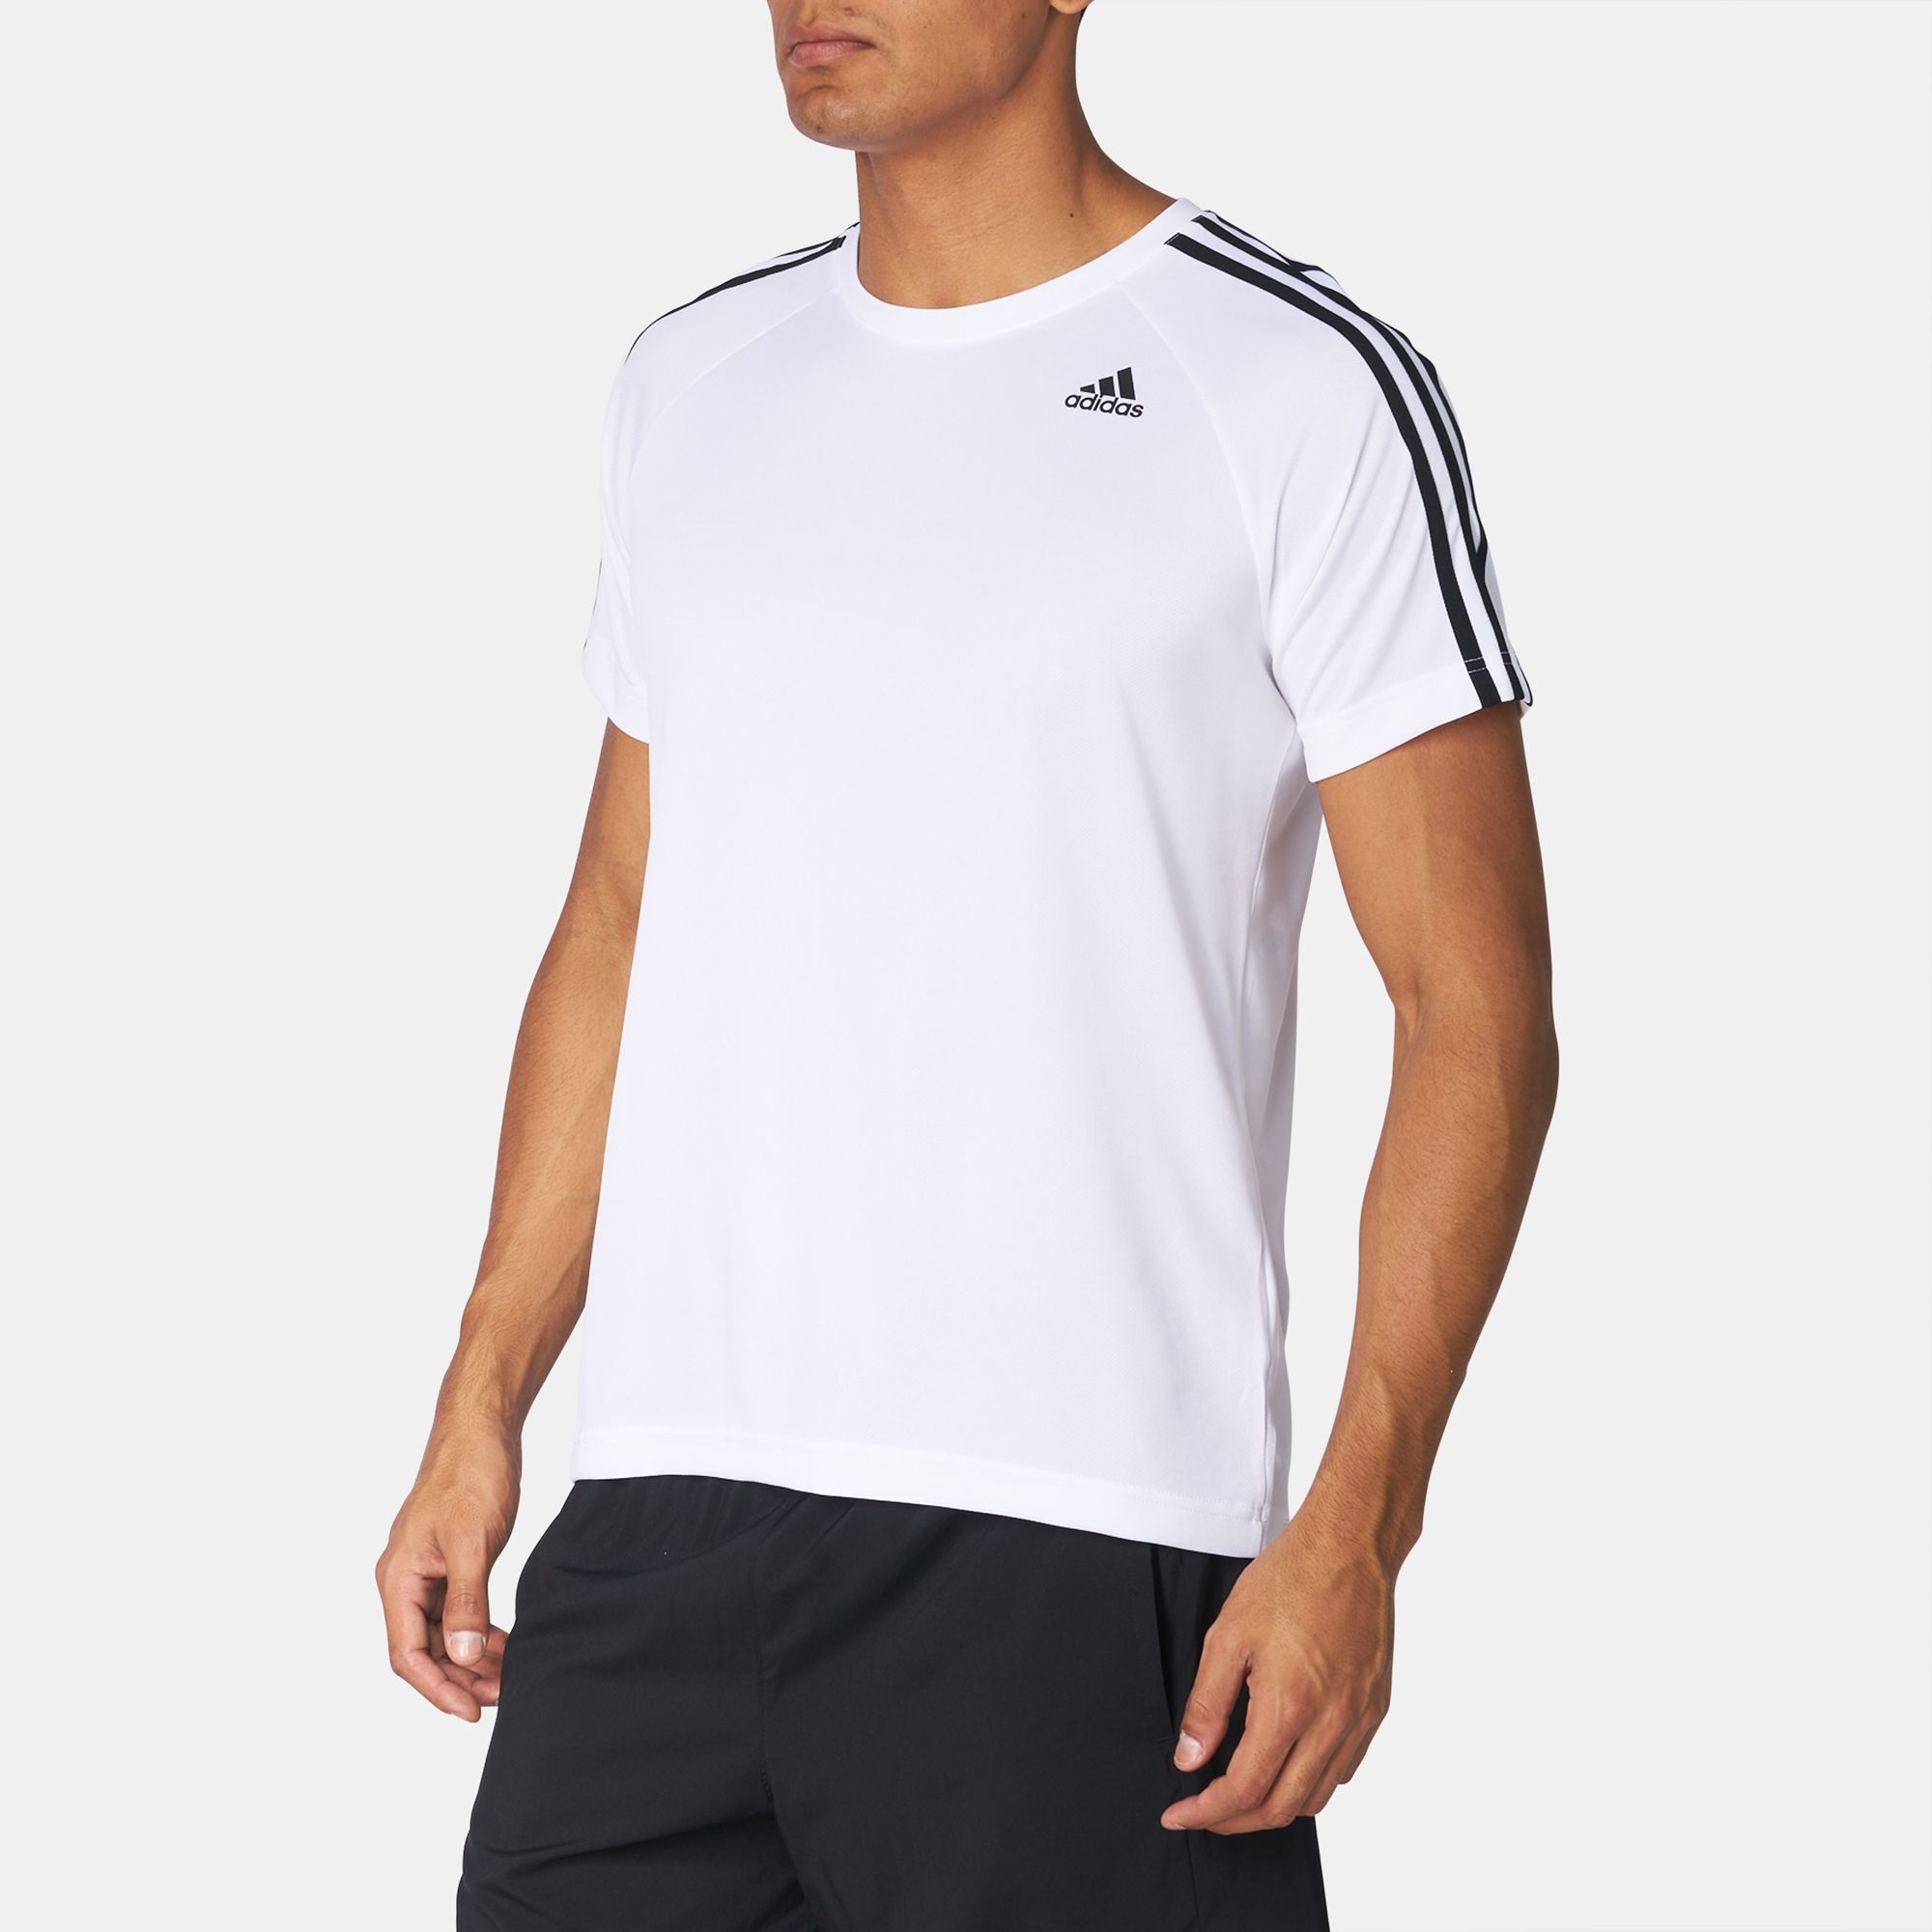 d18ba82c62fef3 Shop White adidas D2M 3-Stripes T-Shirt for Mens by adidas